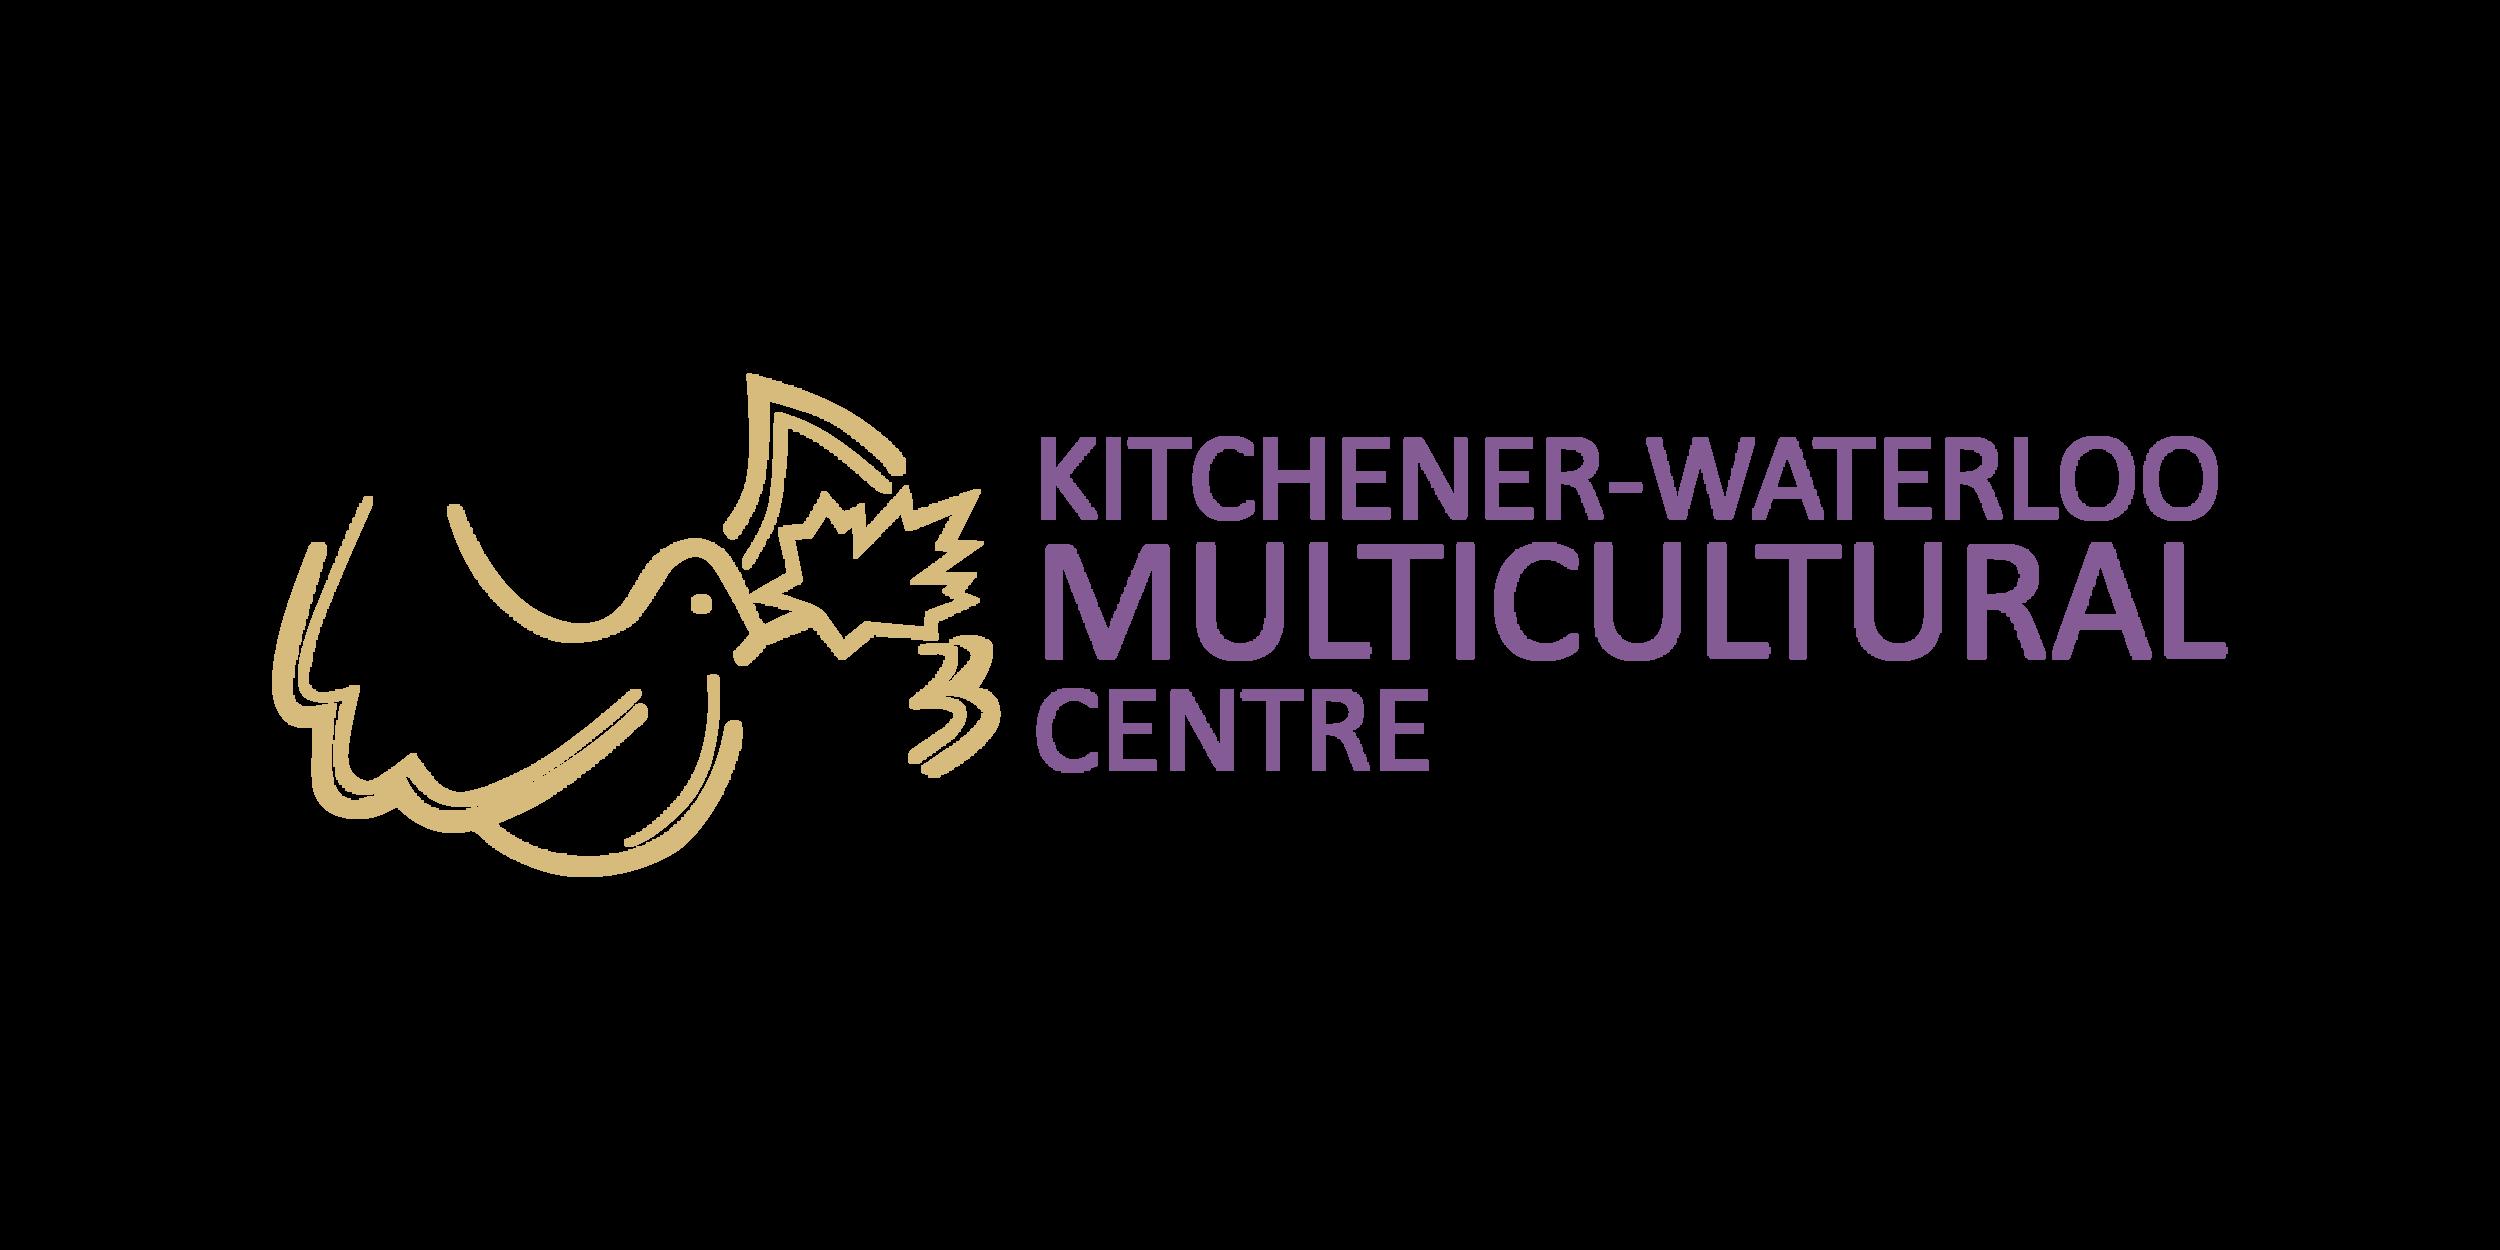 KW Multicultural Centre-logo-01.png